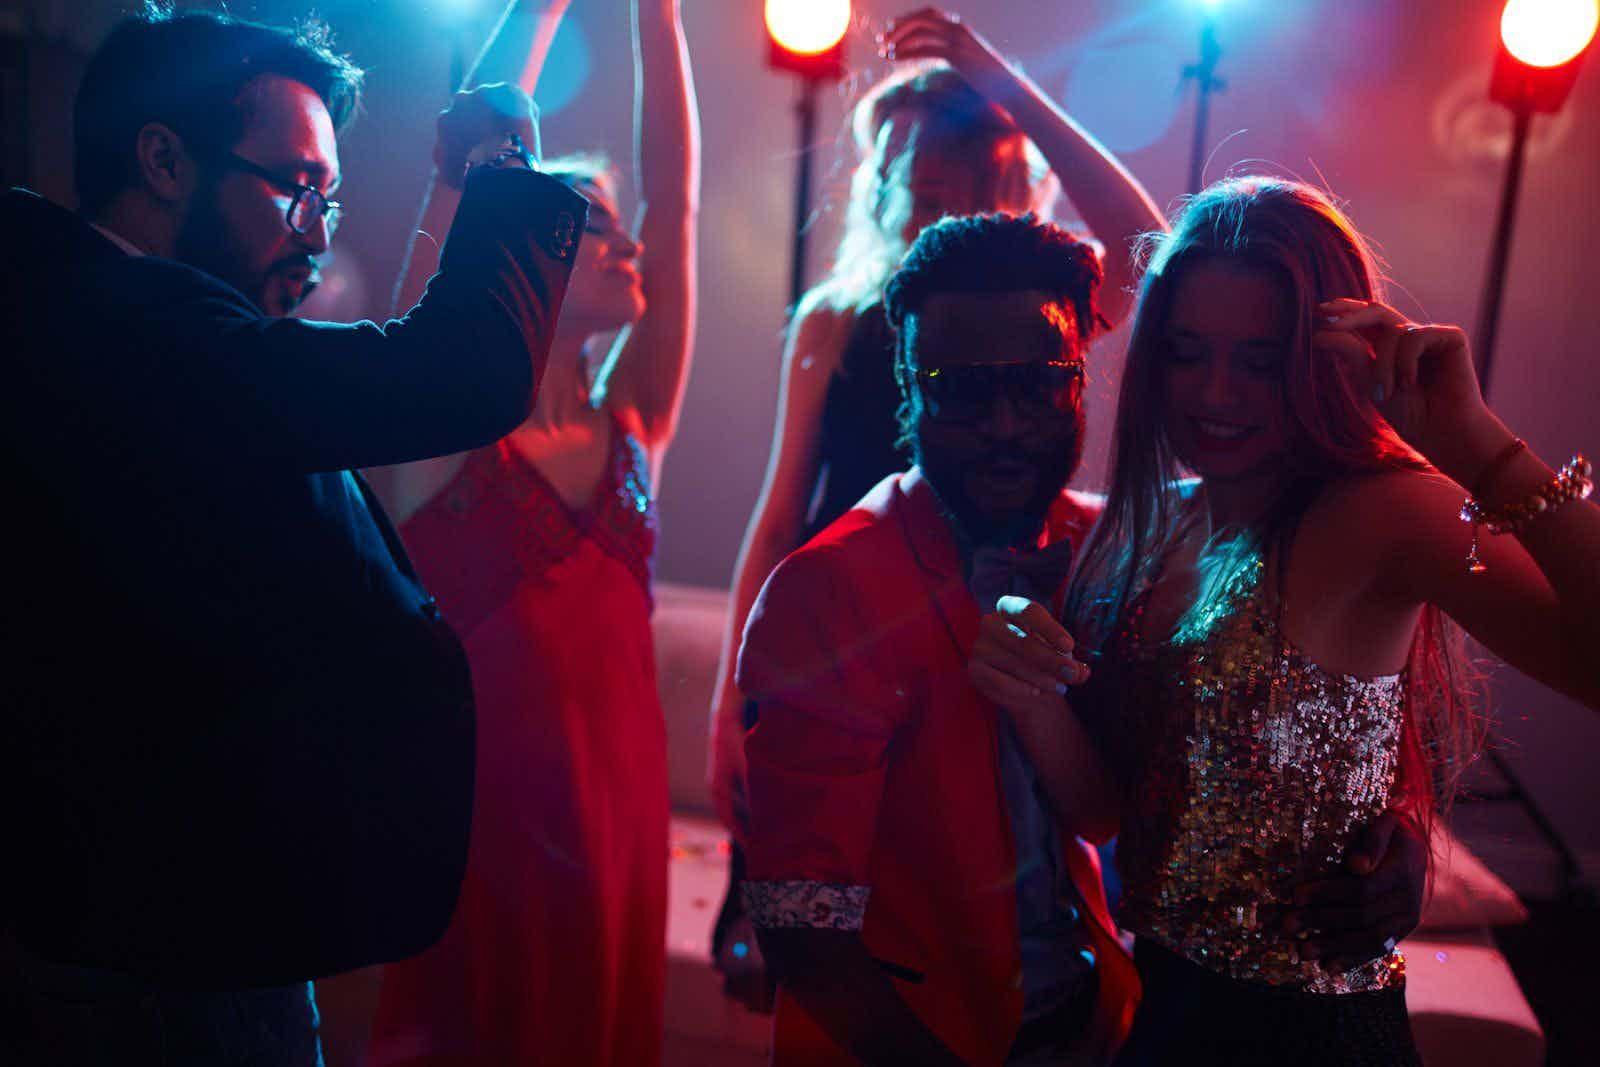 dance-party-4.jpg